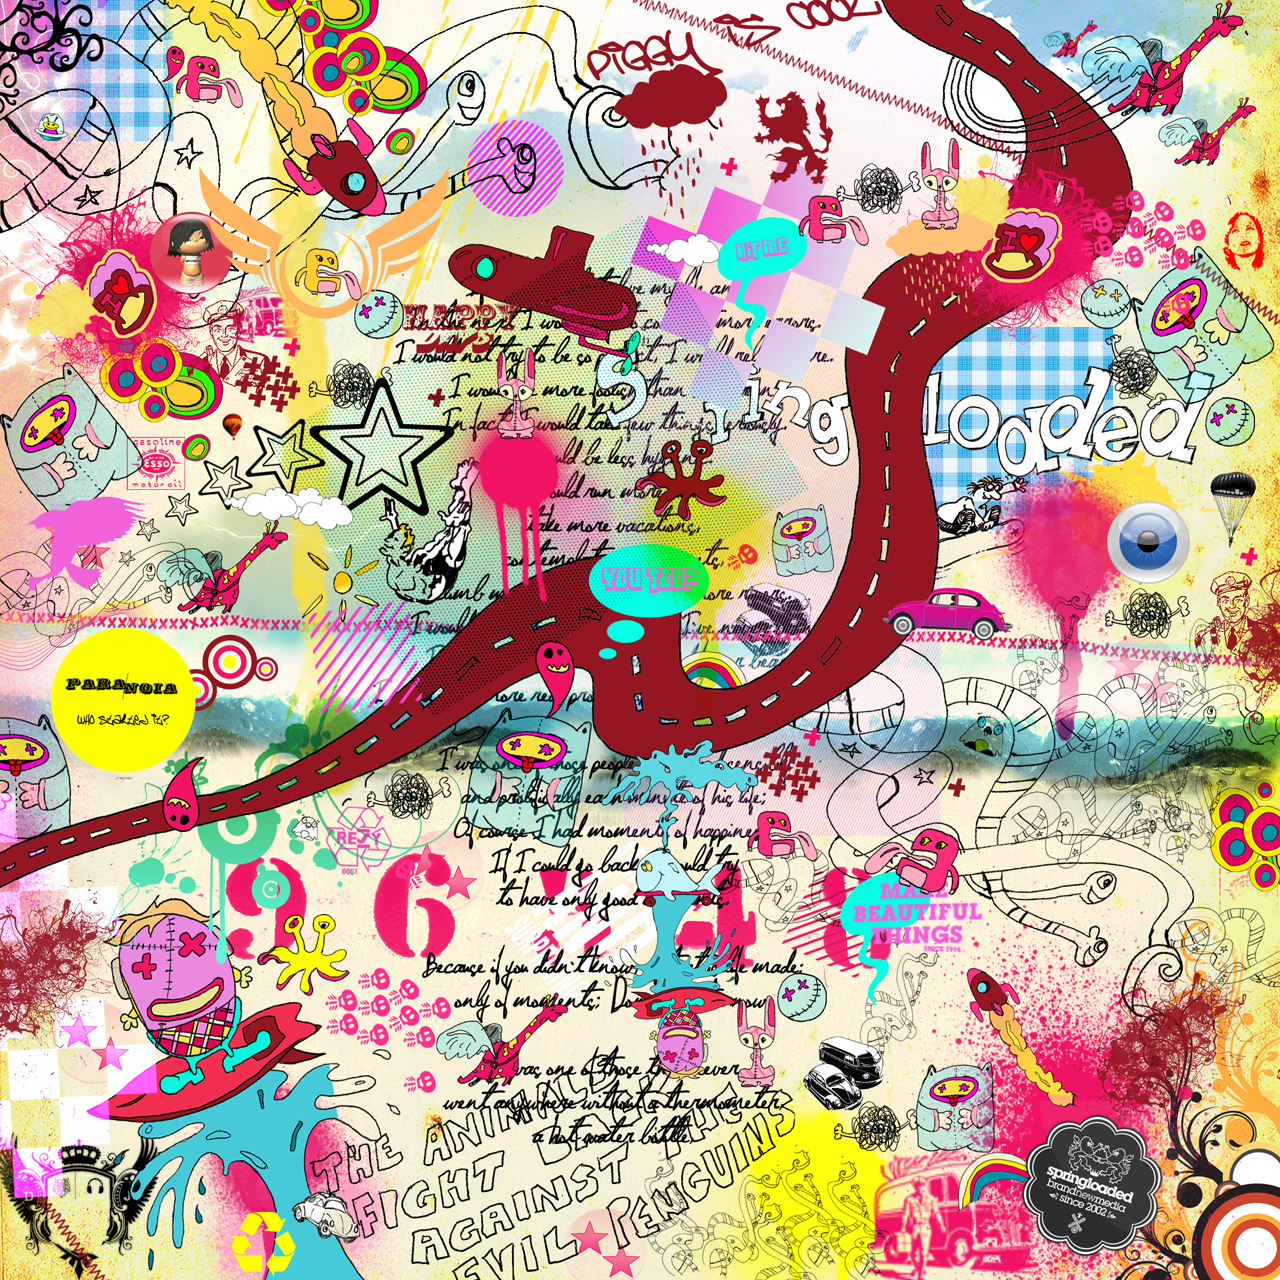 Tagged blue, colour, crazy world, design, desktop wallpaper, doodles,